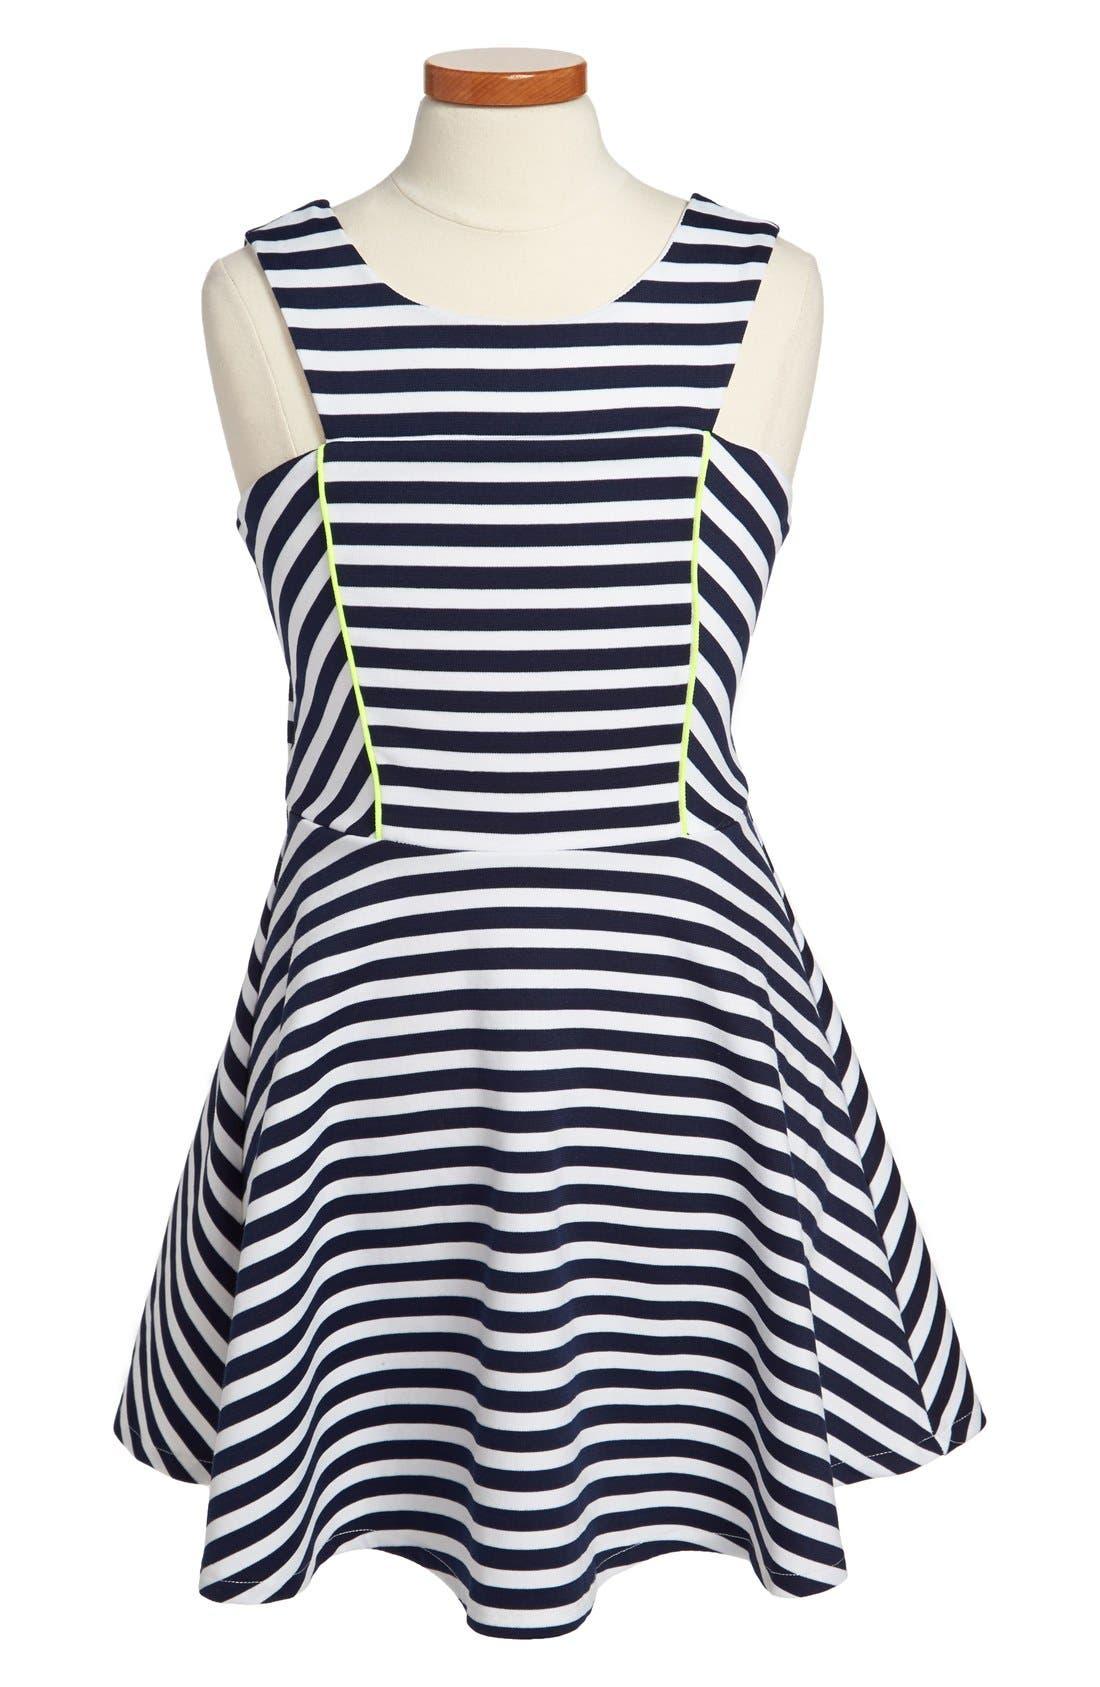 Main Image - Sally Miller 'The West Palm' Stripe Dress (Big Girls)